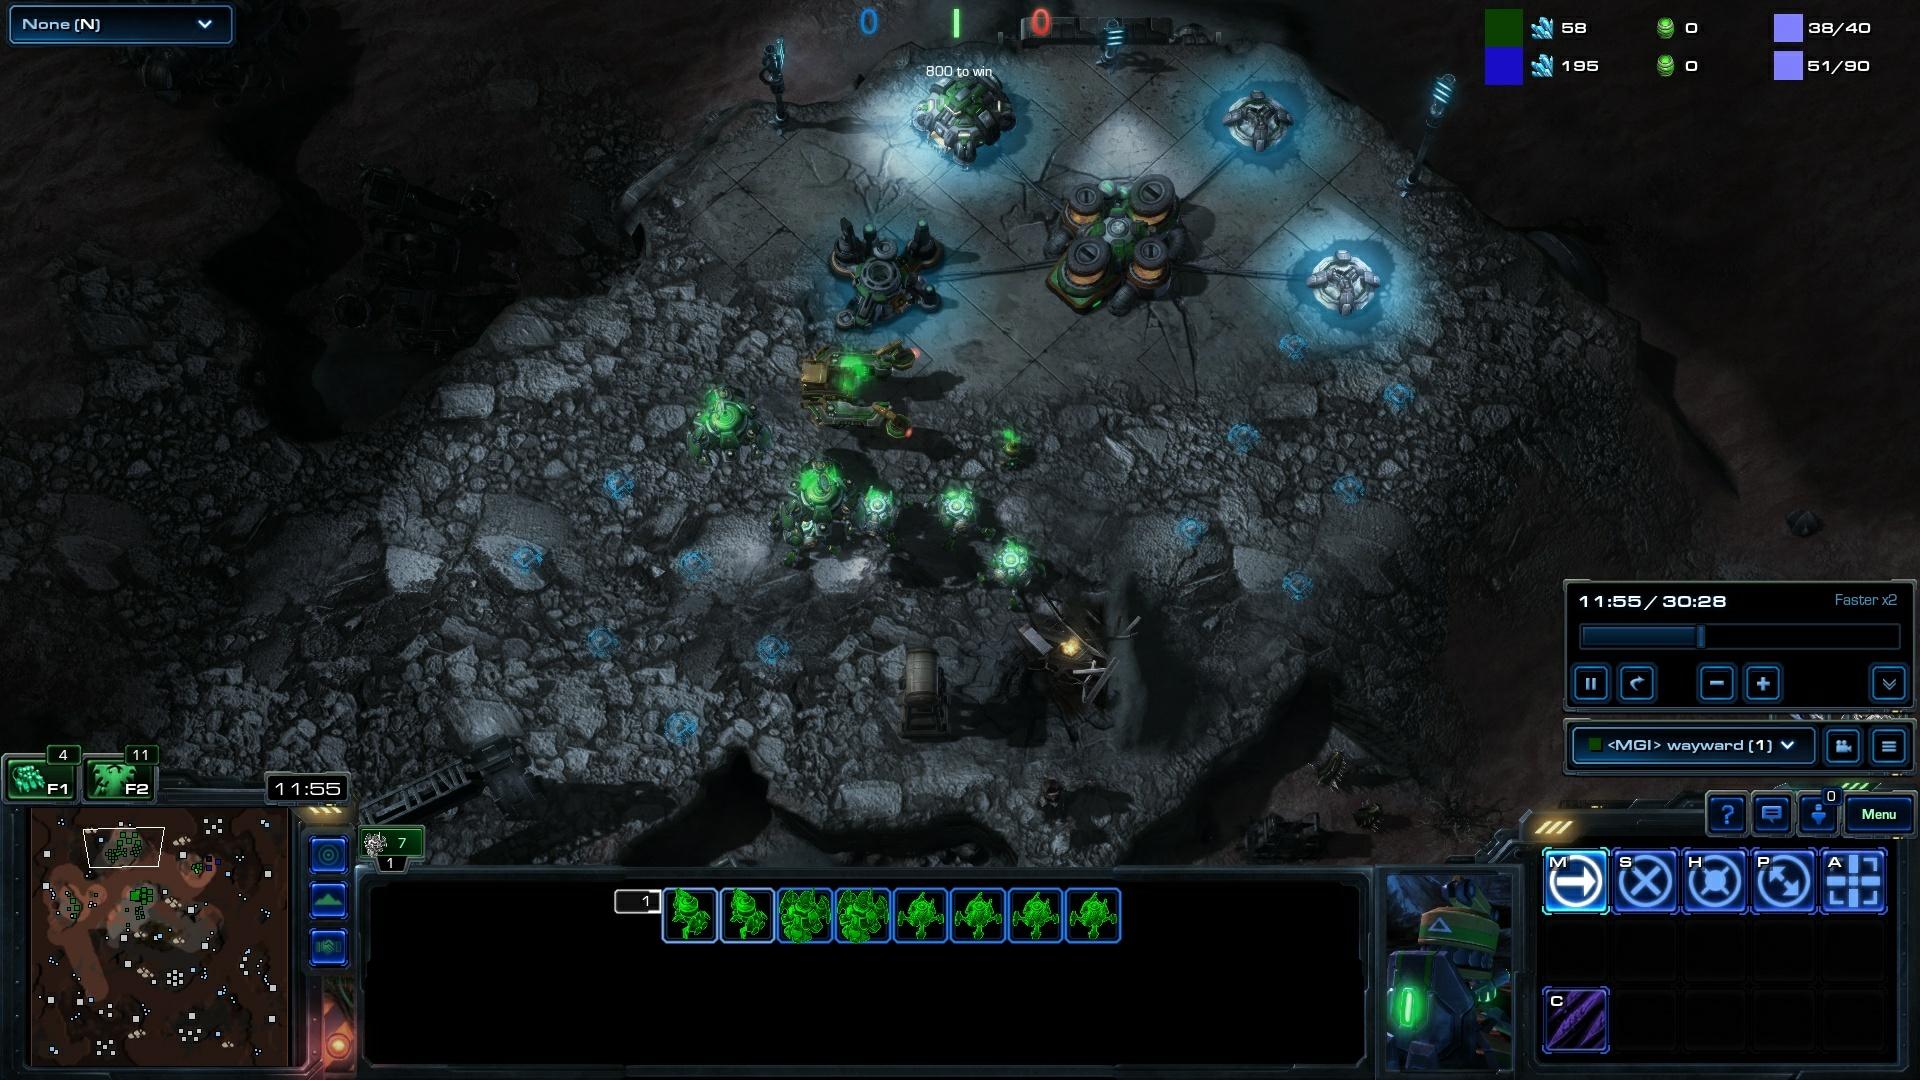 old map] Fabricators defending a Generator image - S.C.R.A.P. mod ...